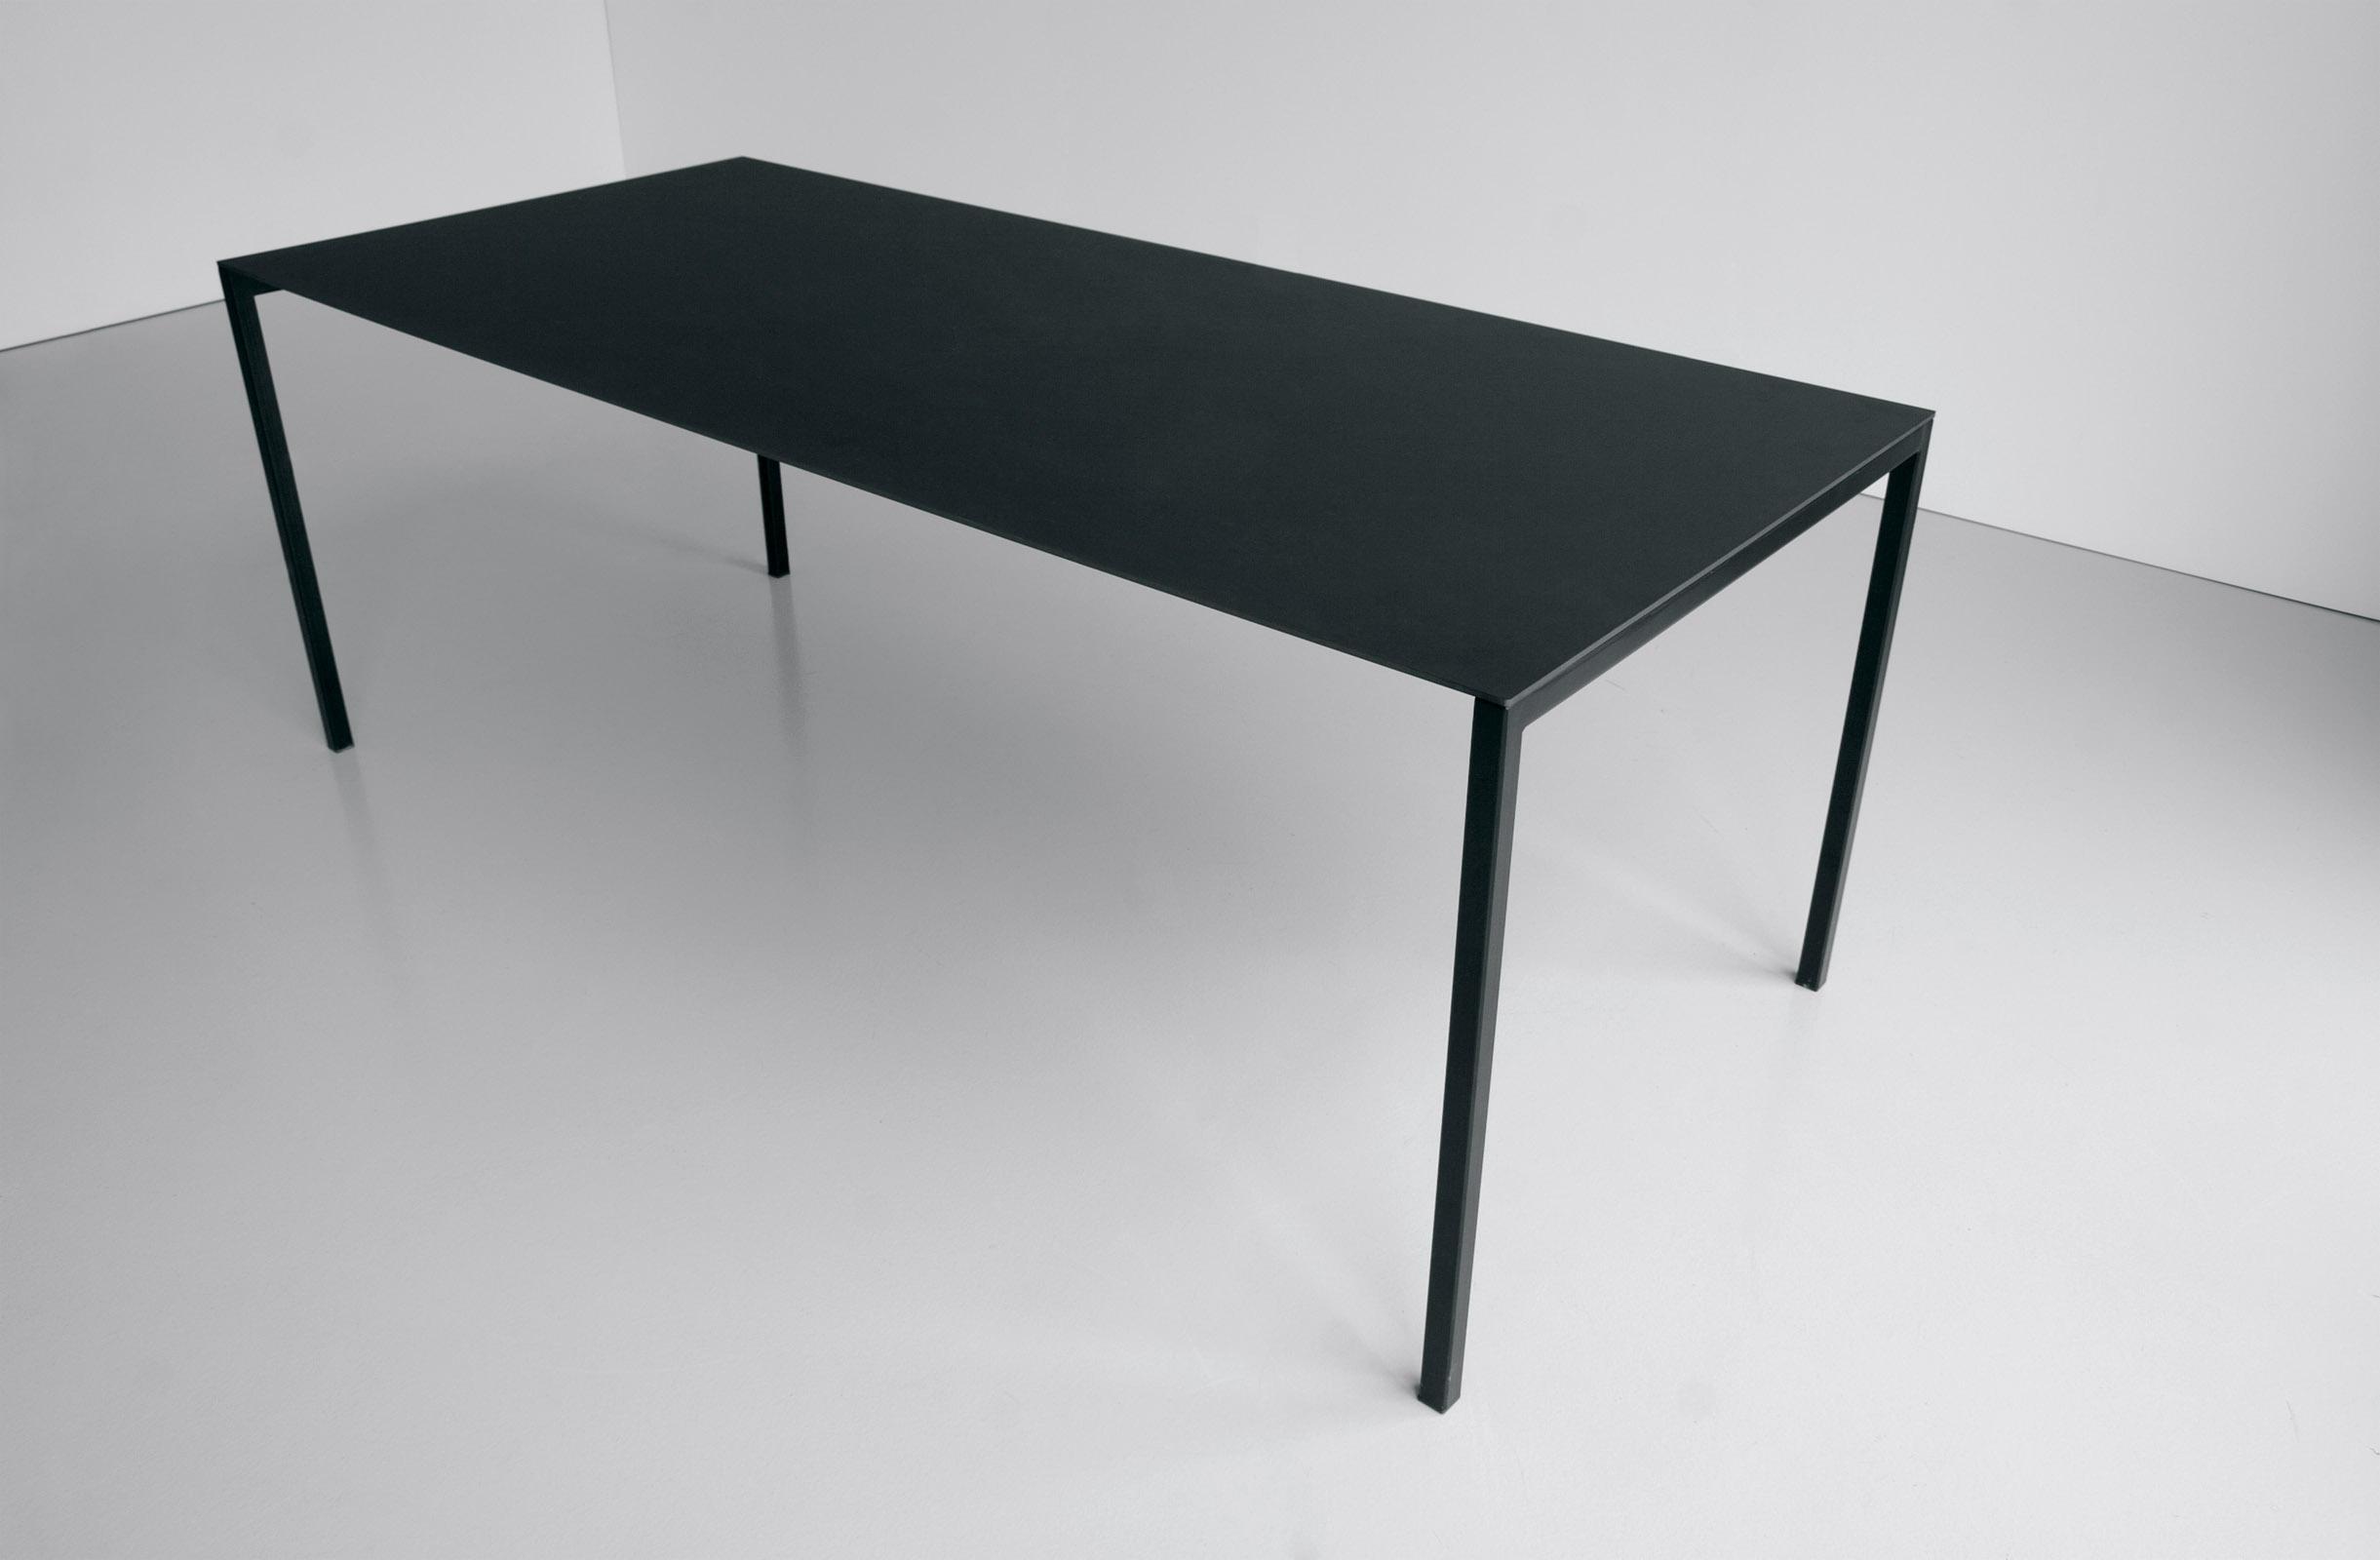 Sintesi st01 tavoli pranzo extendo architonic for Produttori tavoli